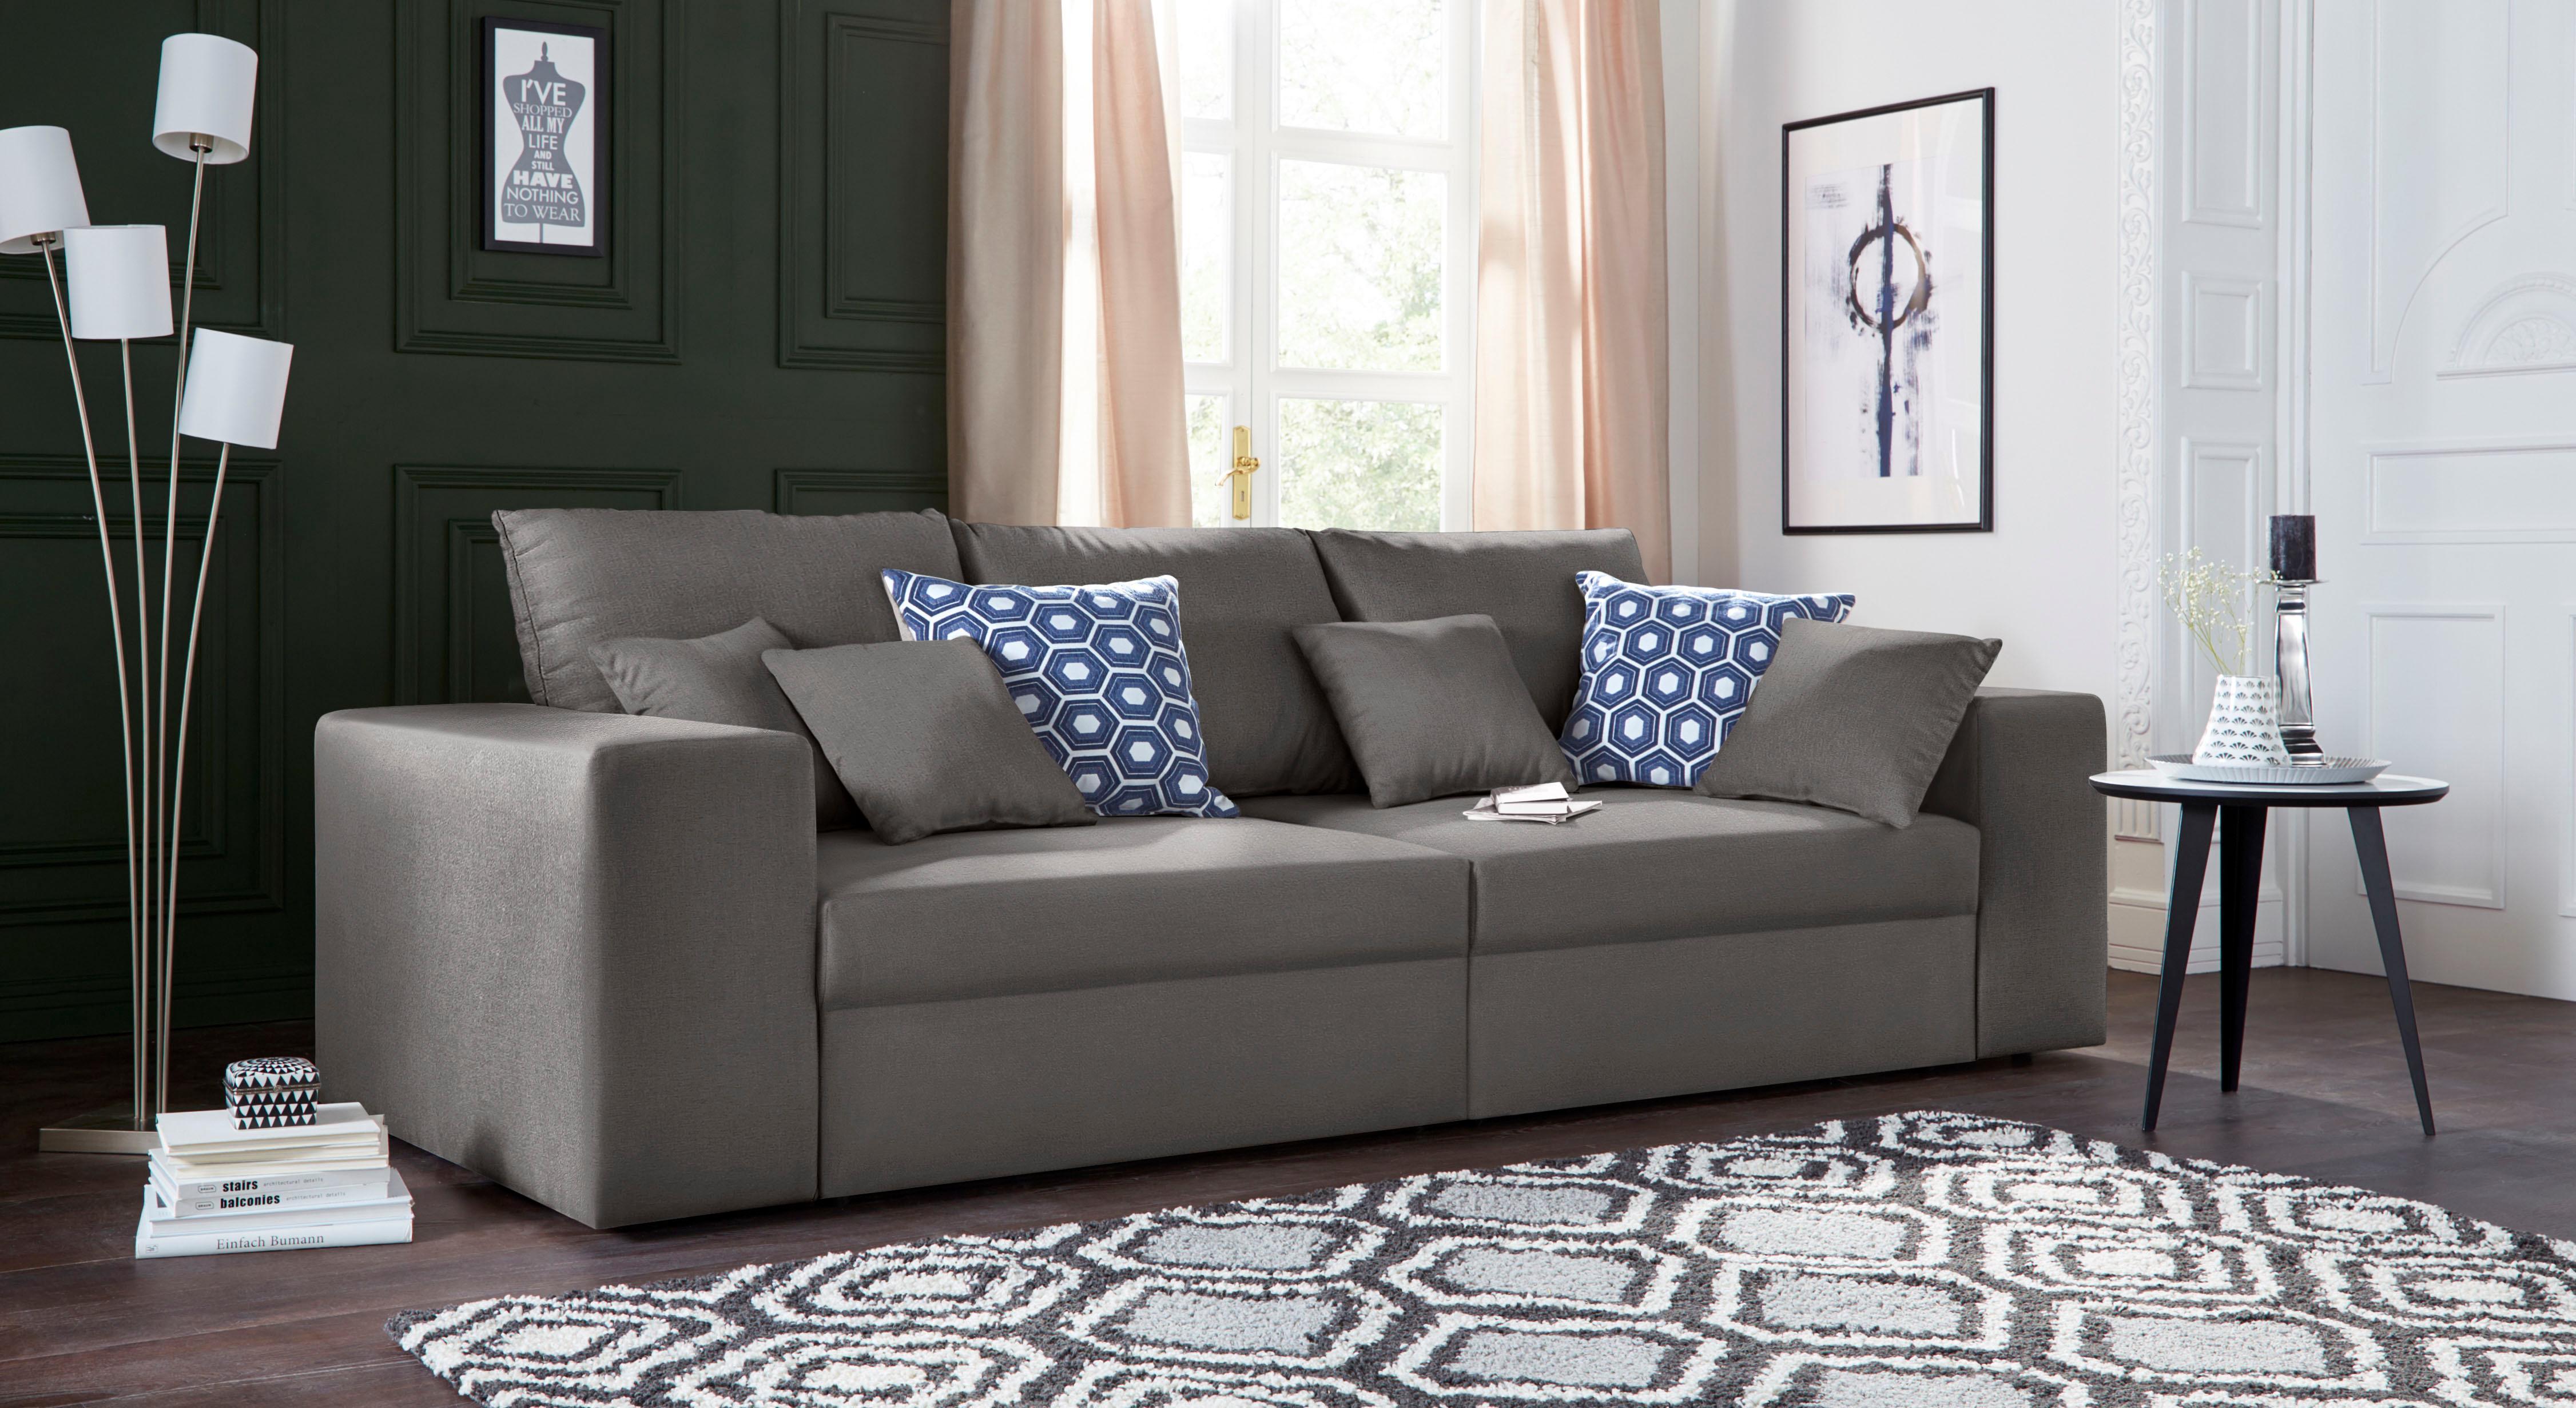 Nova Via Big Sofa kaufen